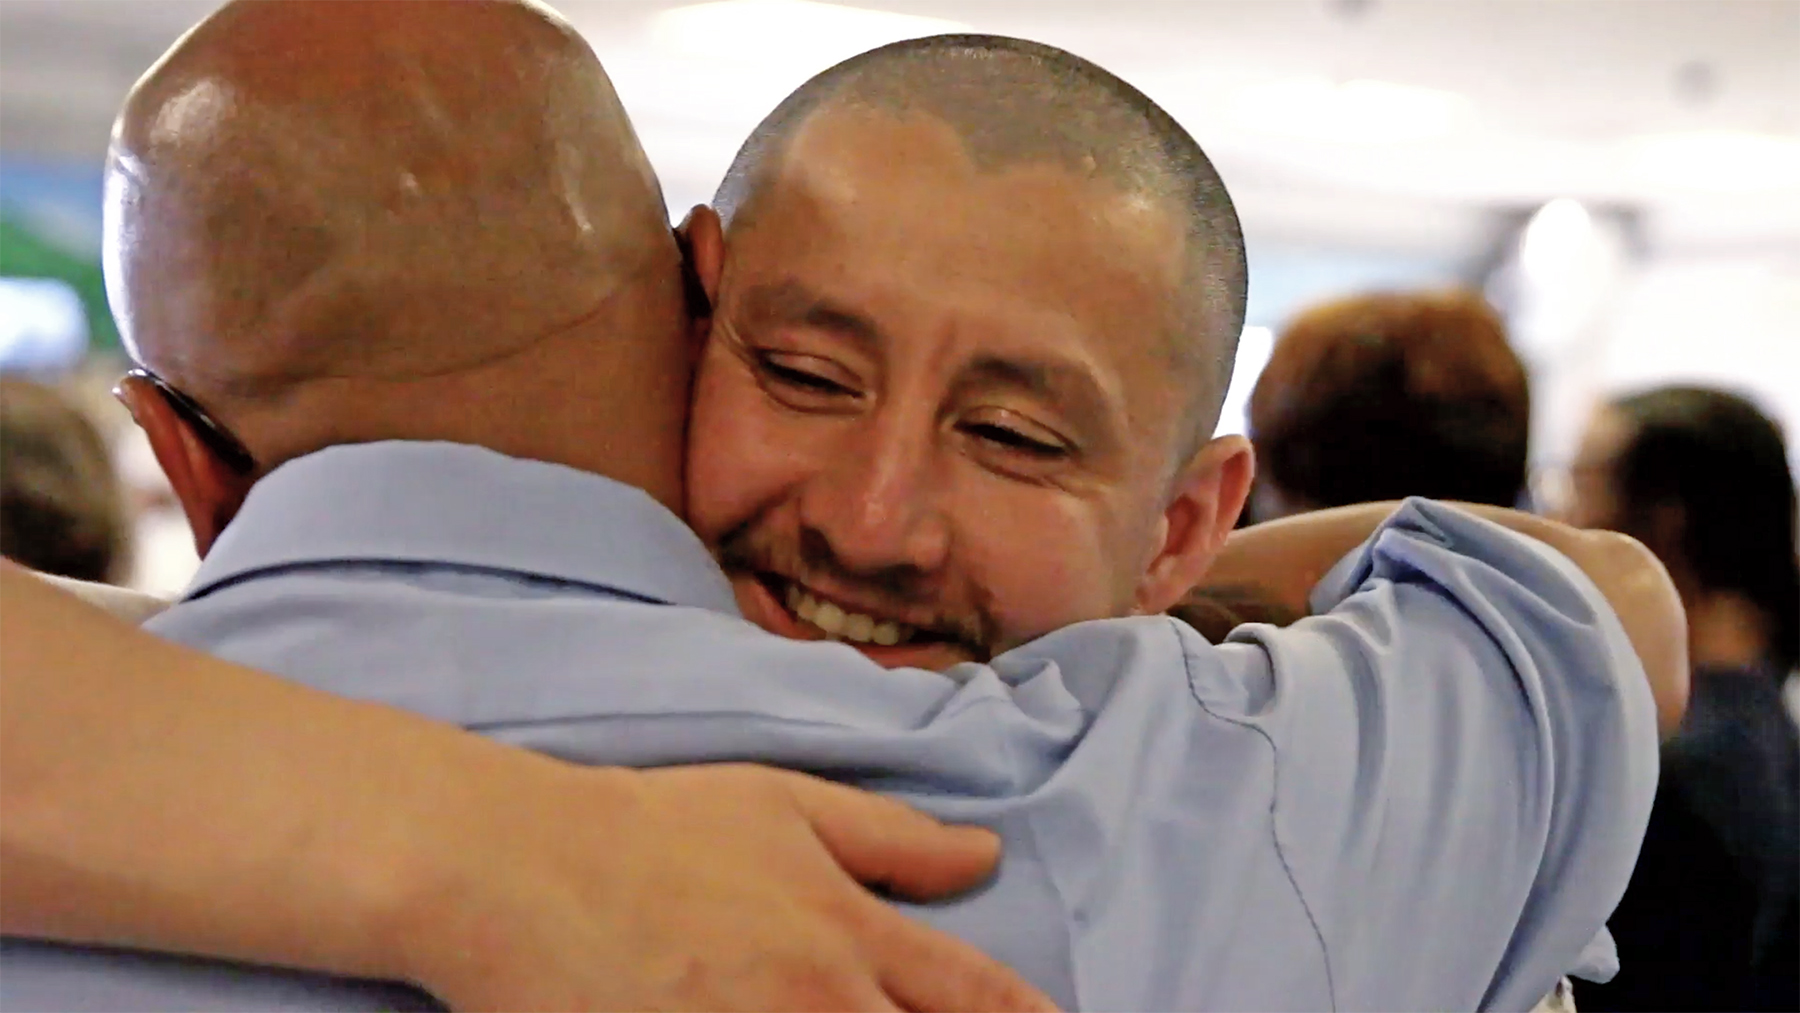 Two men hug.